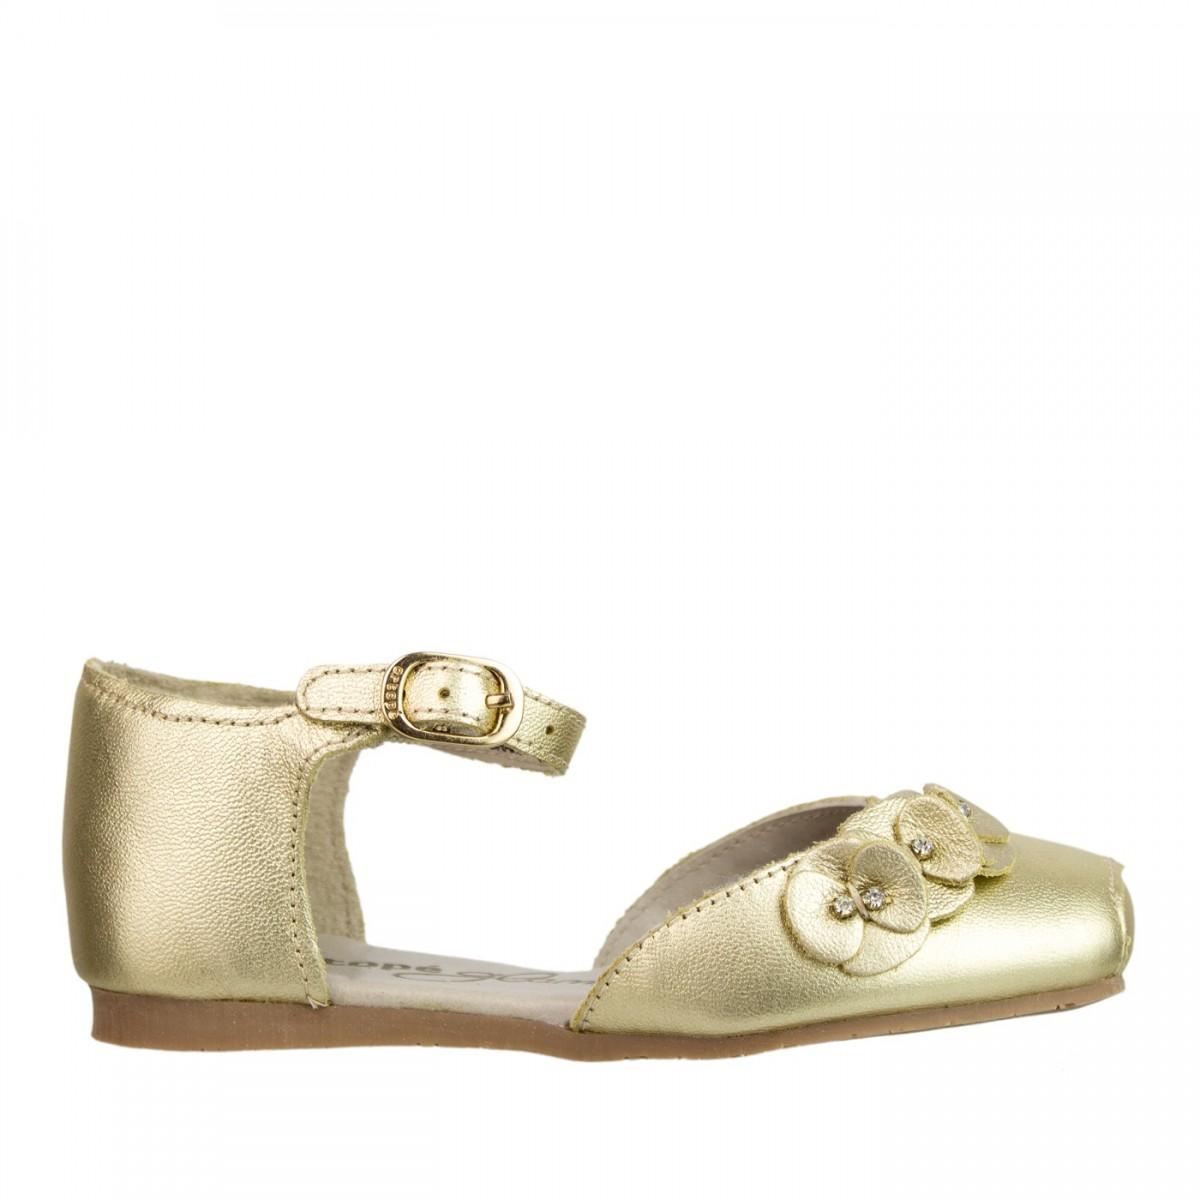 11a00671b85 Bizz Store - Sapatilha Infantil Feminina Ortopé Sapeca Dourada